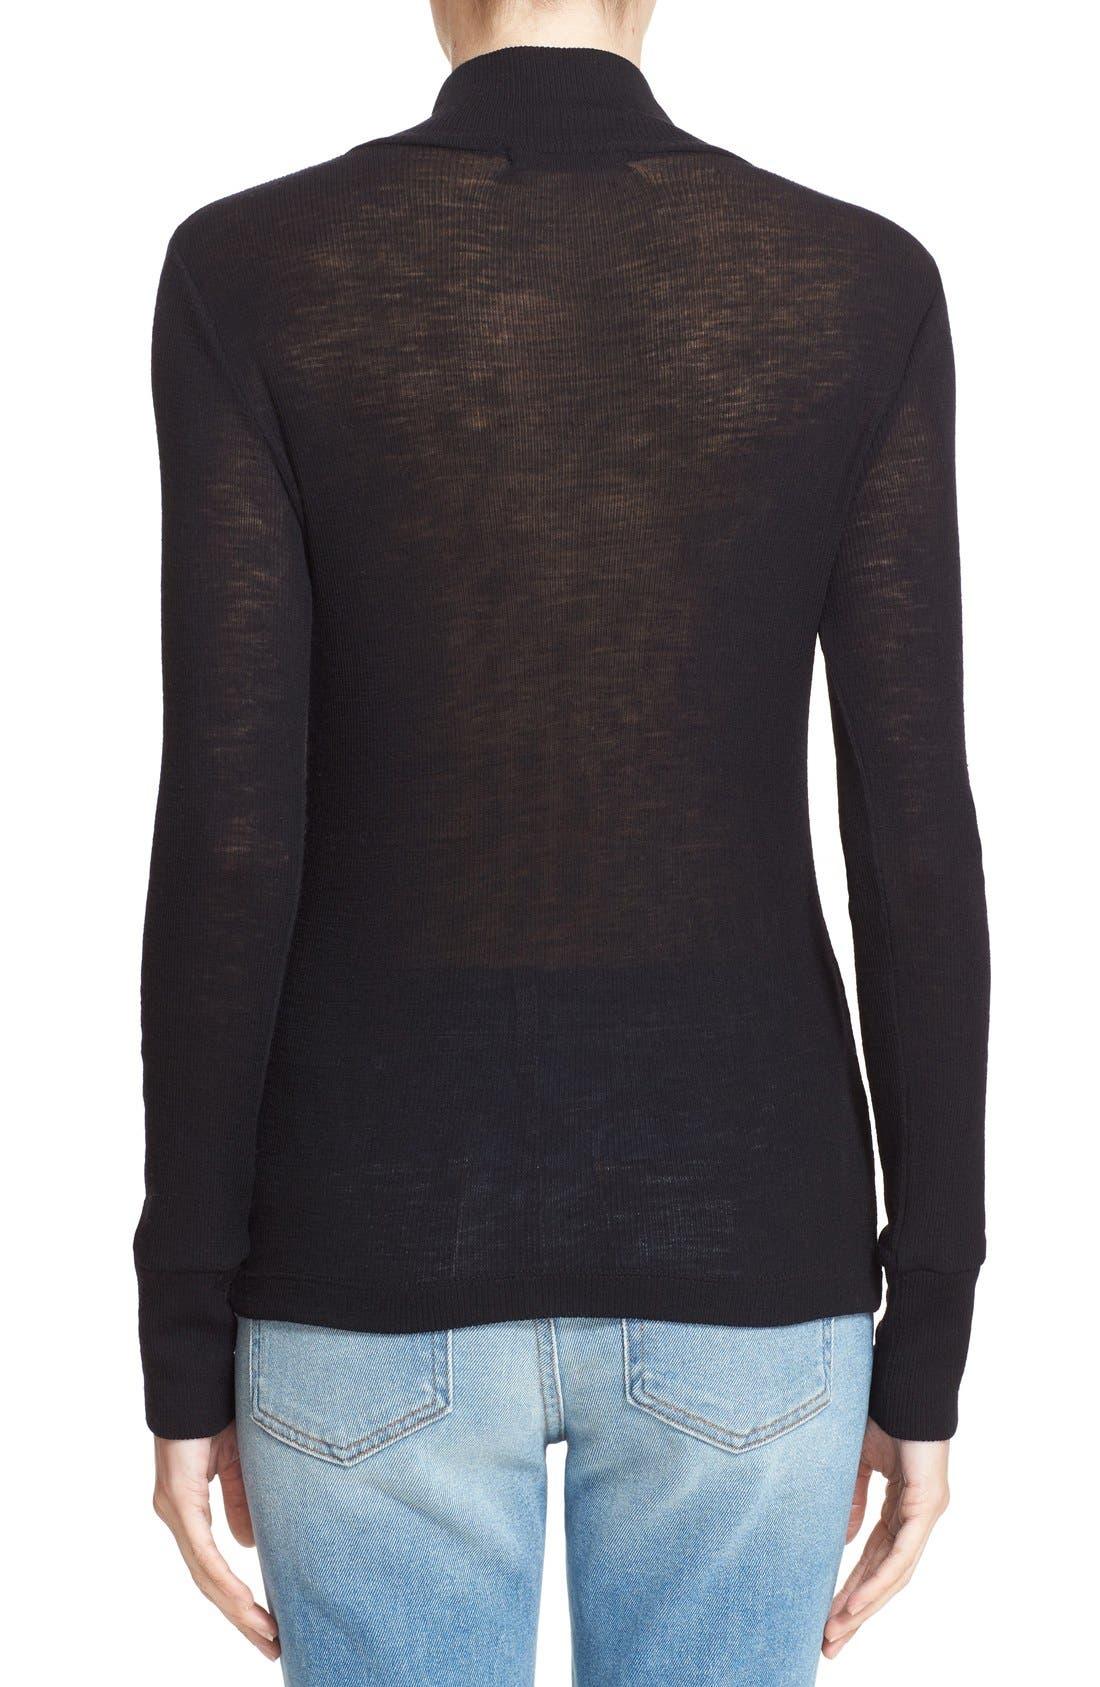 Alternate Image 2  - T by Alexander Wang Rib Knit Wool Sweater